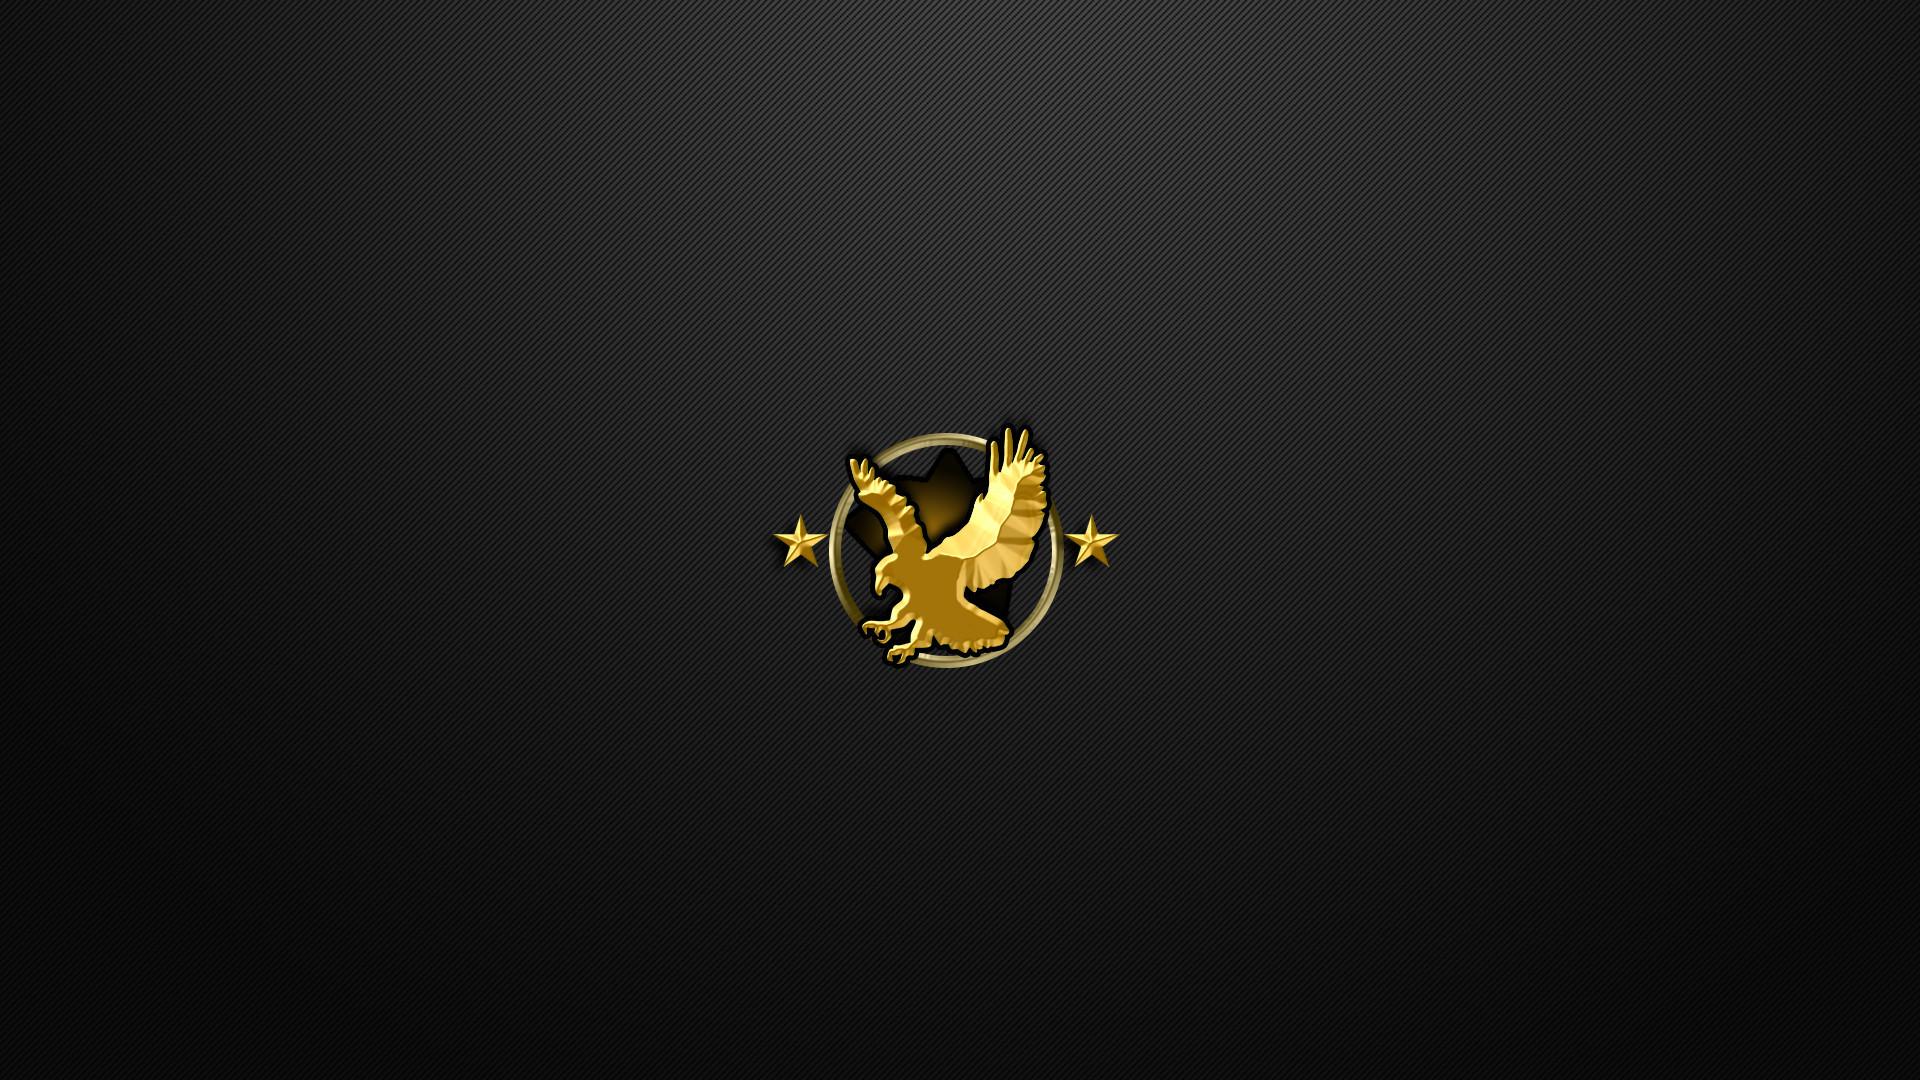 Cs Rank Legendary Eagle HD Wallpaper     ID:55735